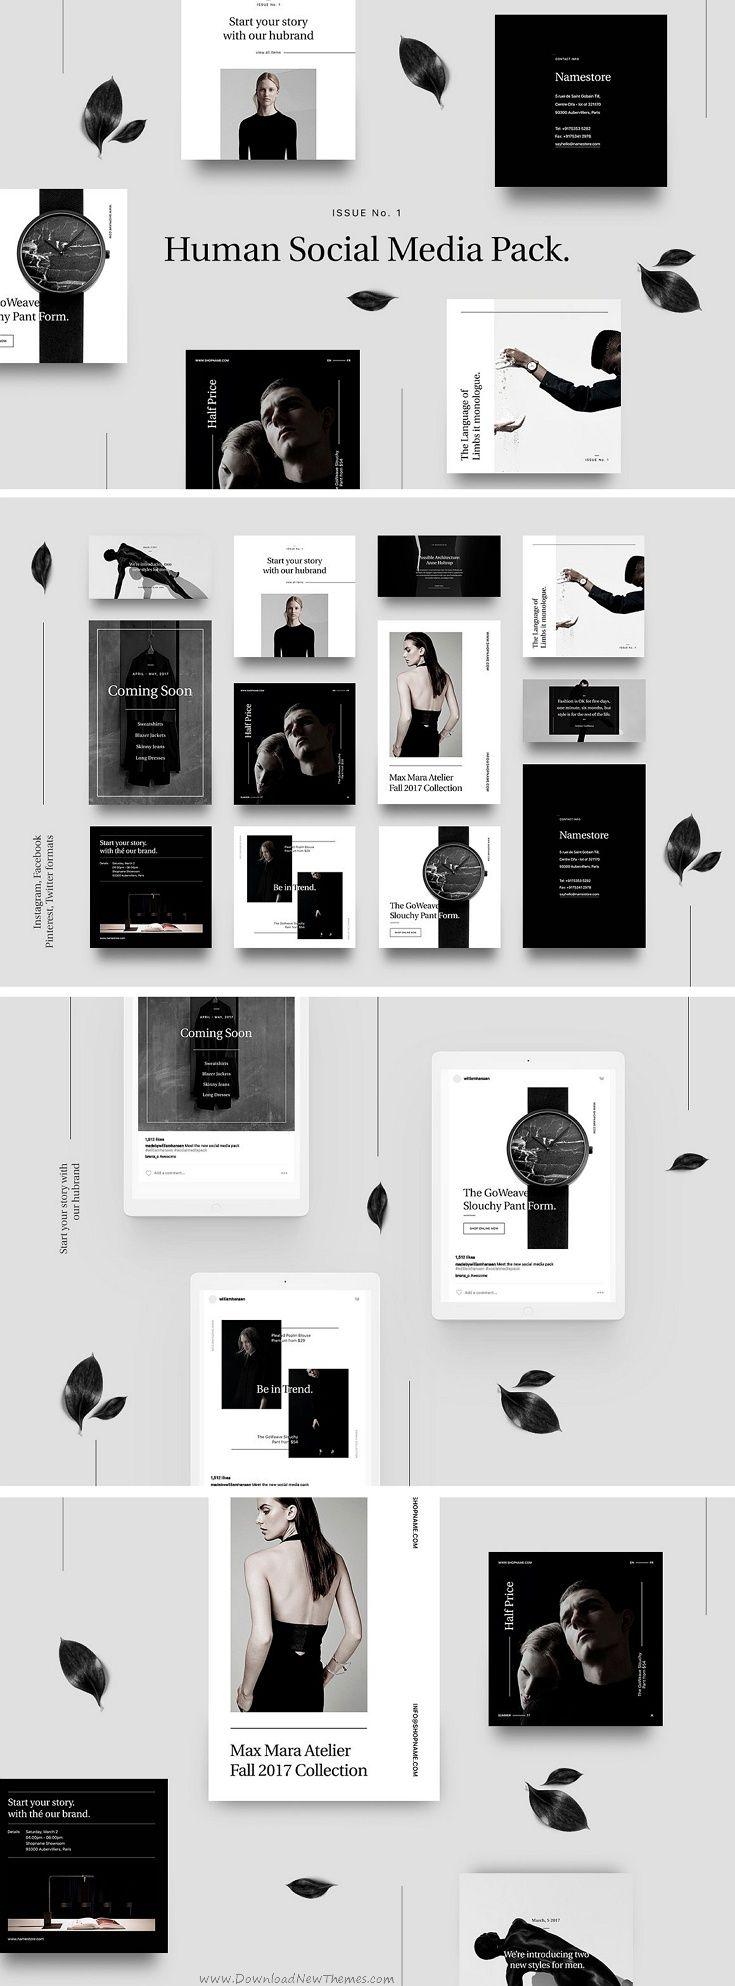 Human Social Media Pack #graphics #web #elements includes 12 #templates designed natively for Facebook, Instagram, Pinterest and Twitter download now➩ https://creativemarket.com/William_Hansen/1325684-Human-Social-Media-Pack.?u=Datasata